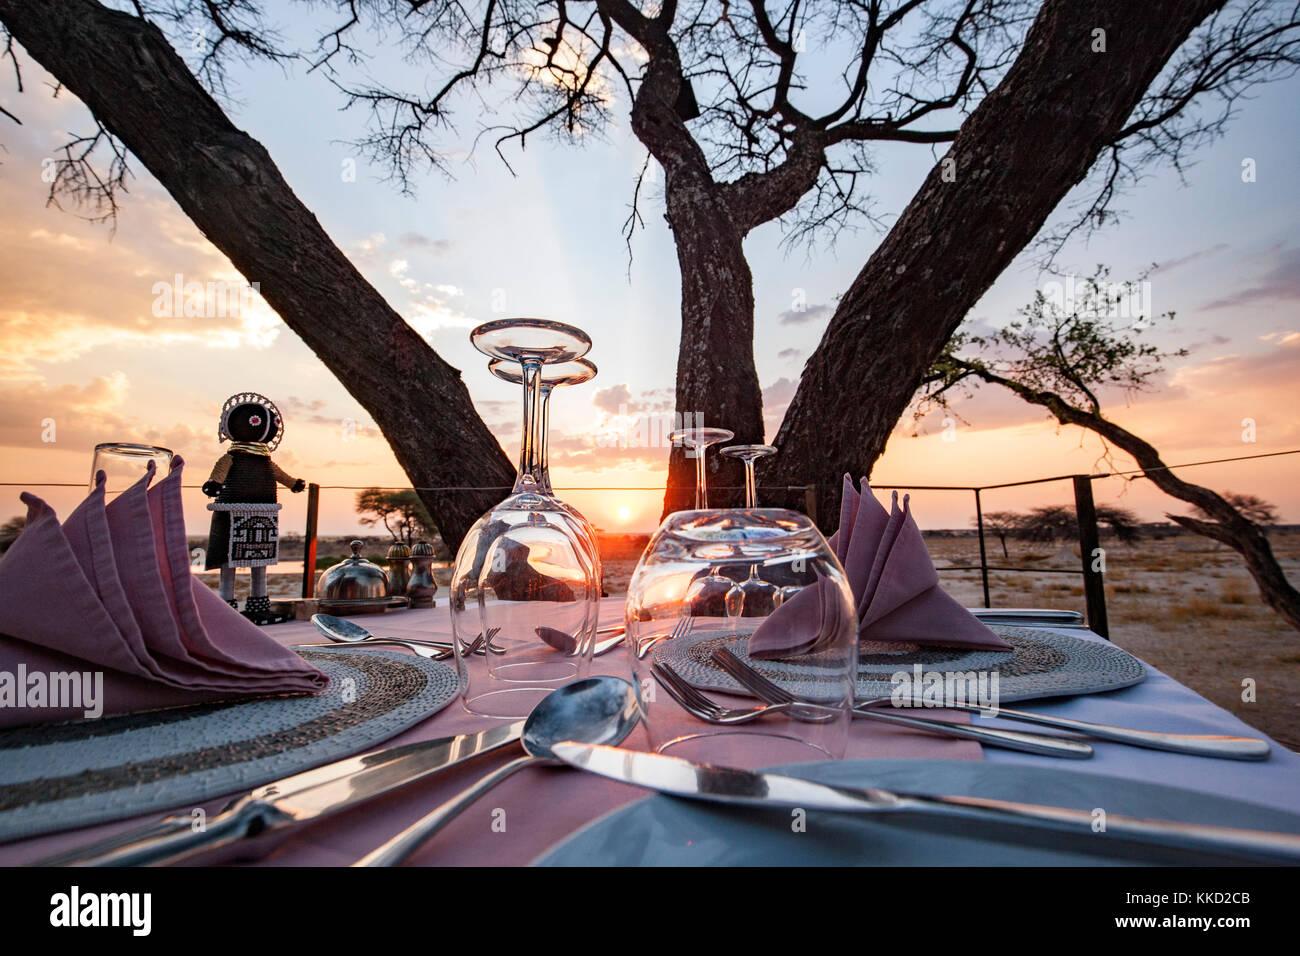 Atardecer en el fort, onguma onguma Game Reserve, Namibia, África Imagen De Stock